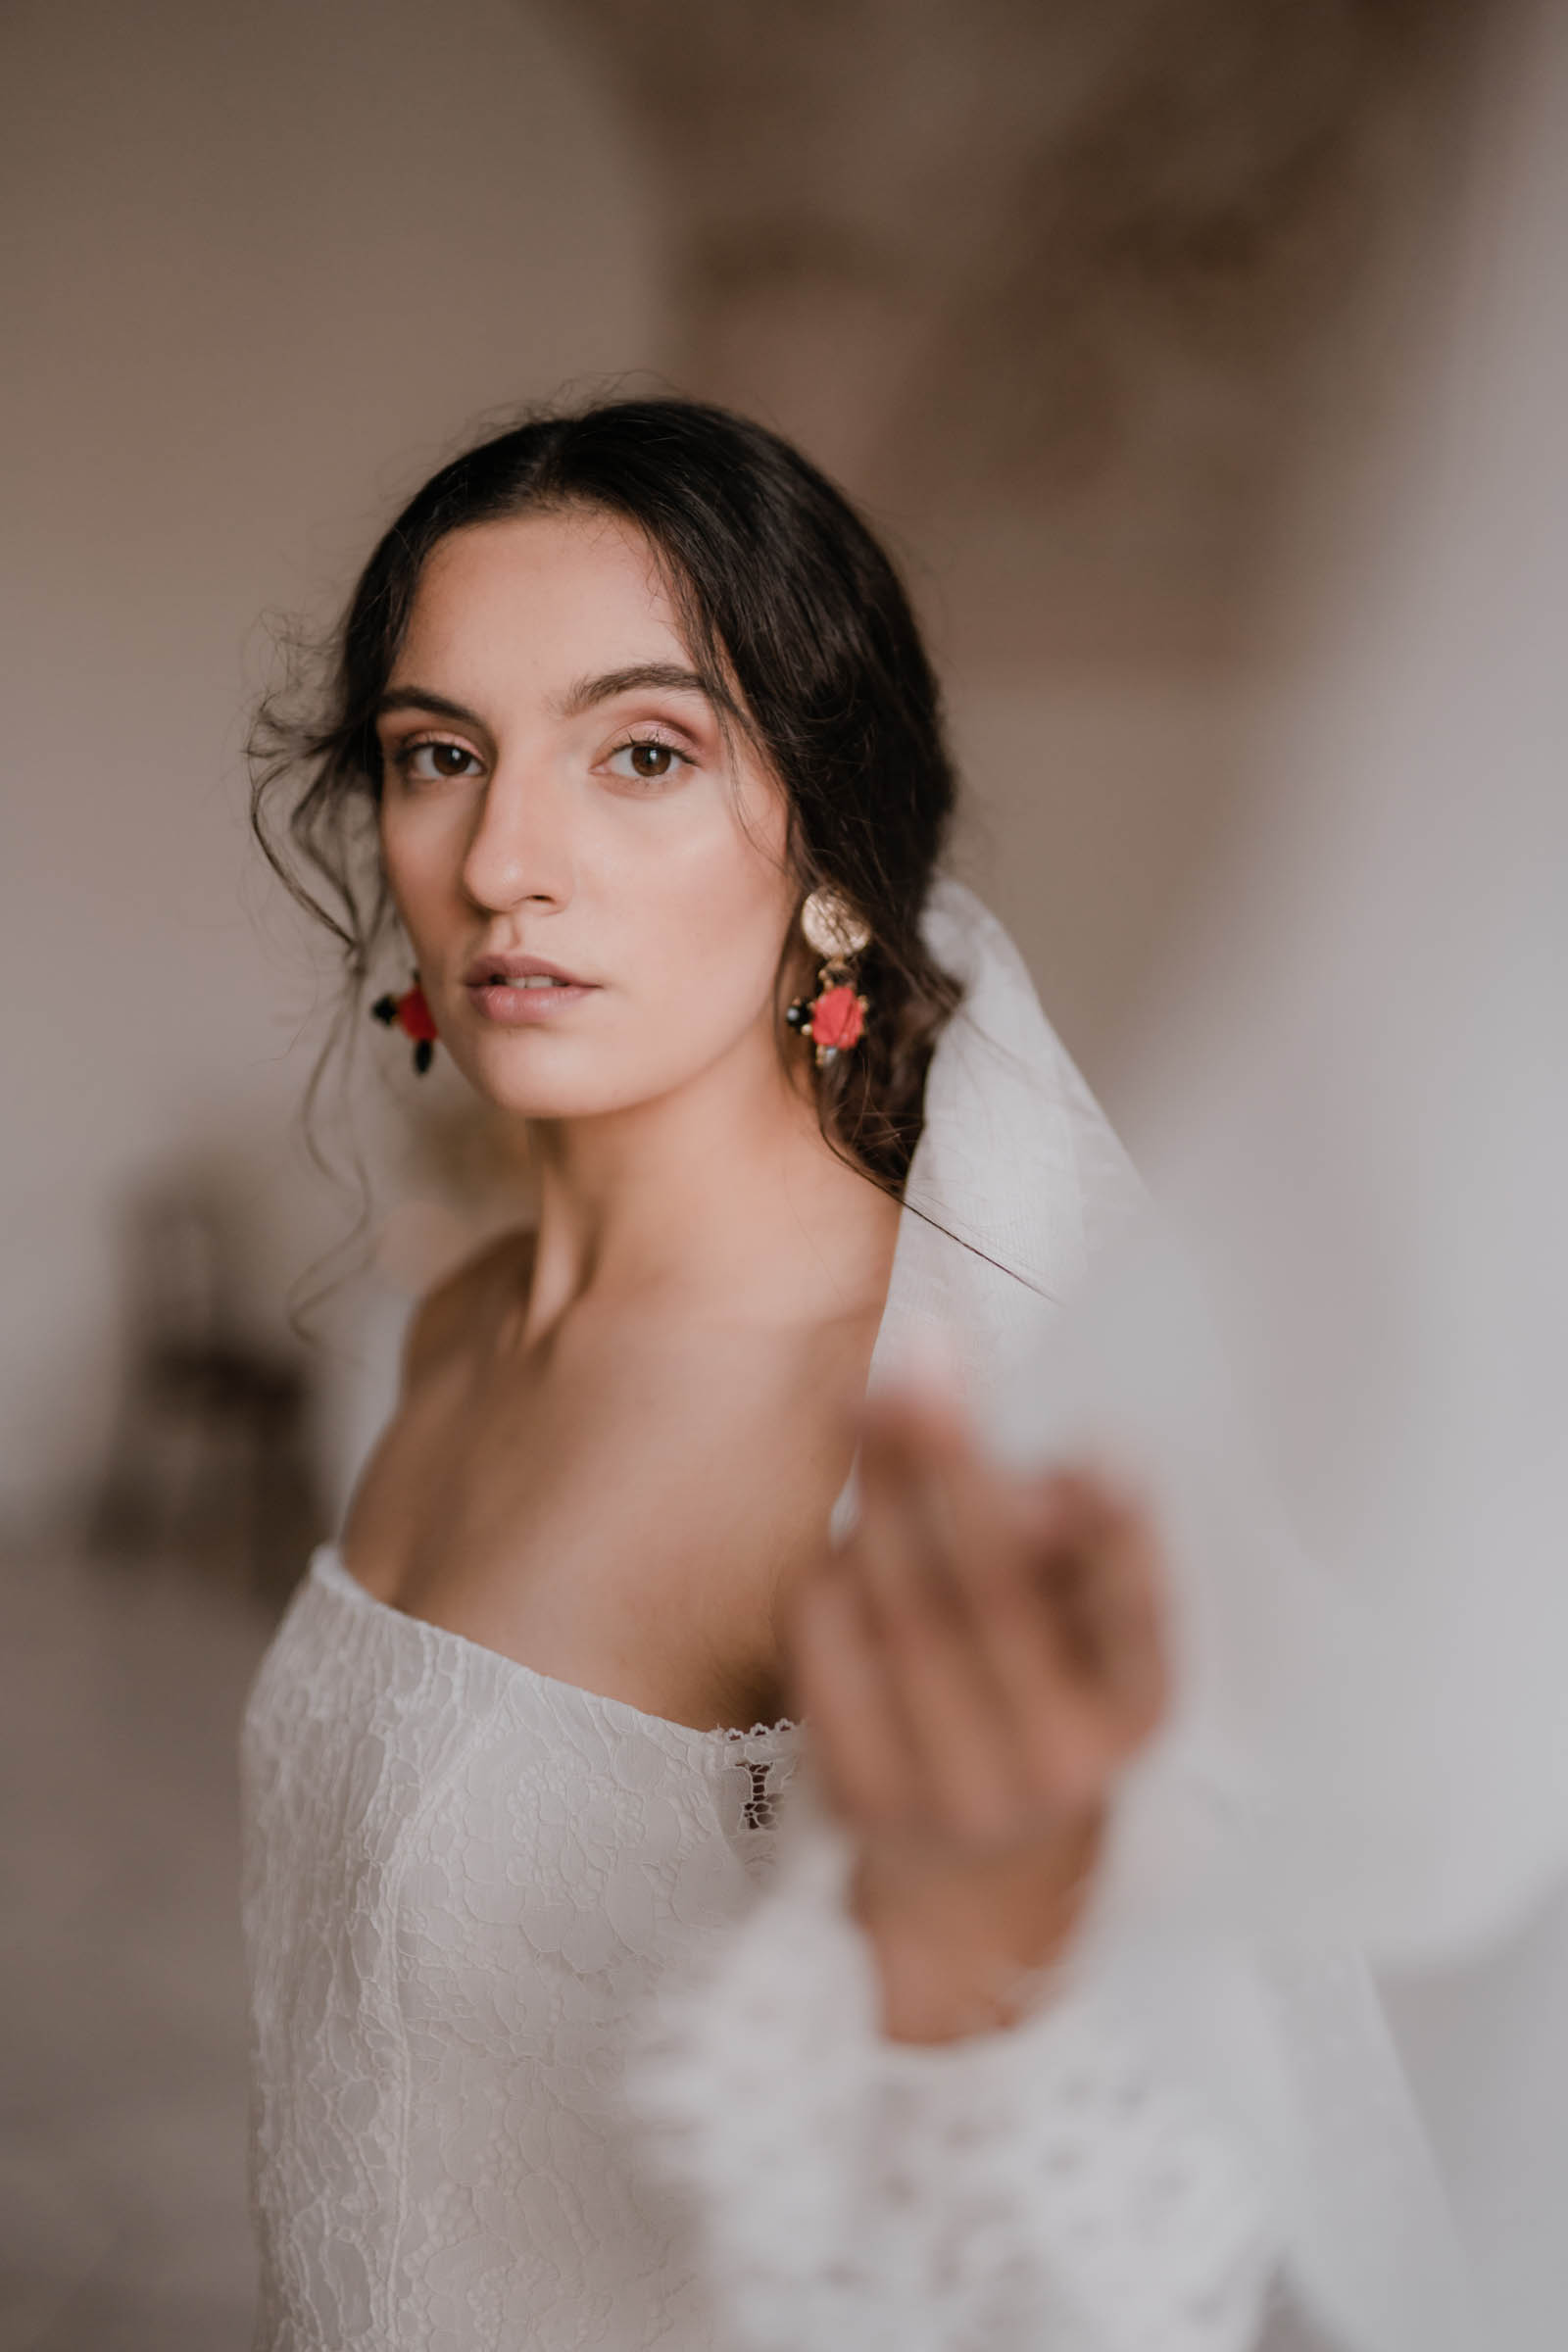 boho-svadobne-saty-veronika-kostkova-wedding-atelier-kolekcia-2019-alba-1